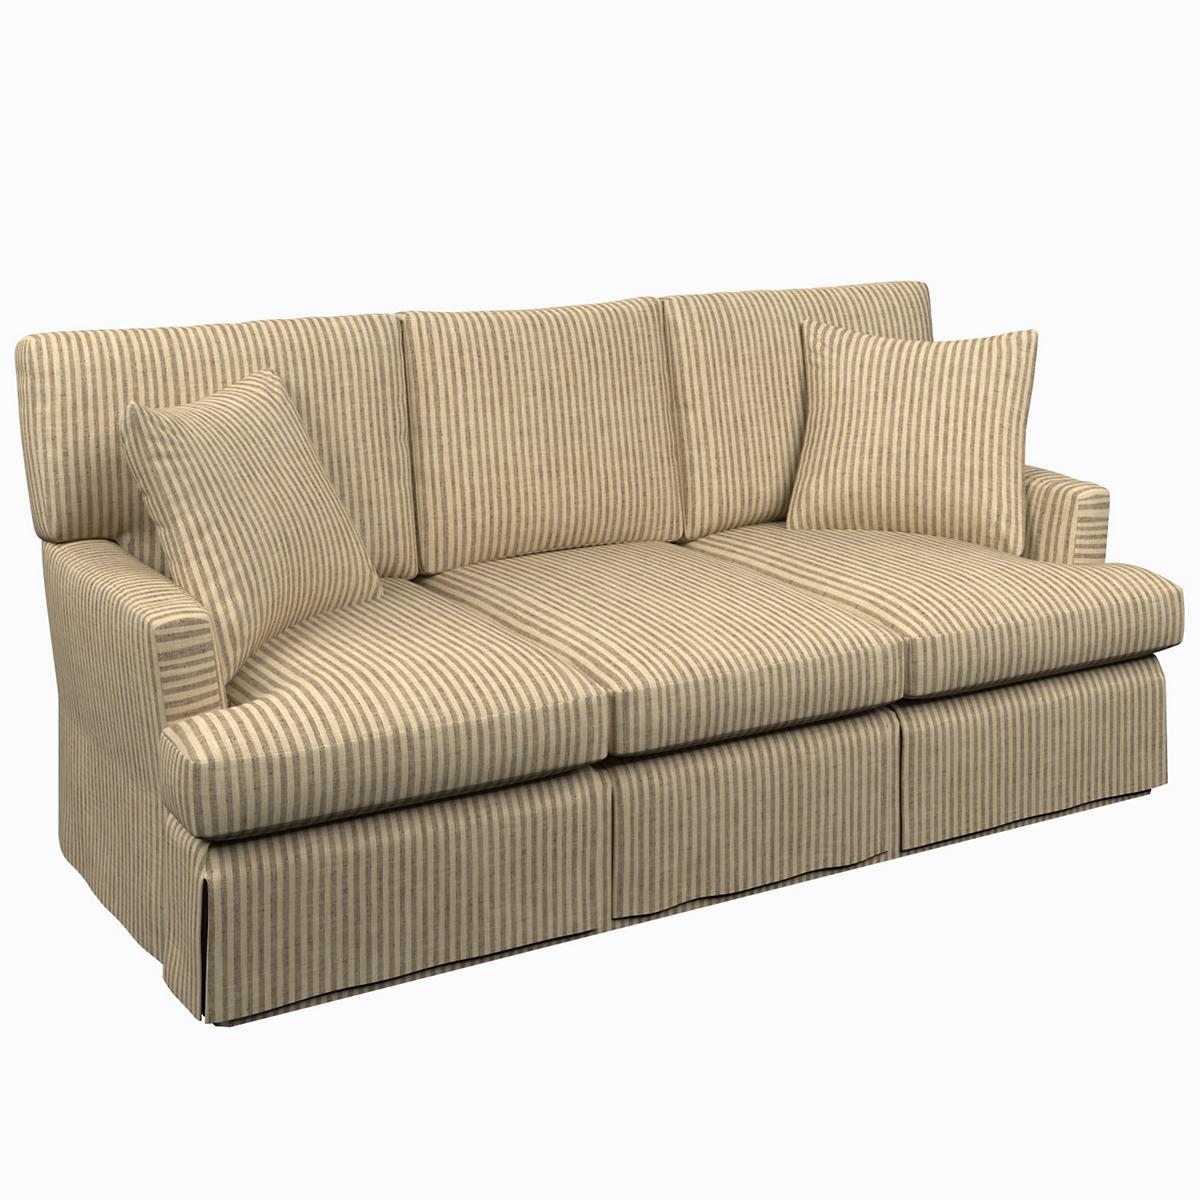 Adams Ticking Brown Saybrook 3 Seater Slipcovered Sofa